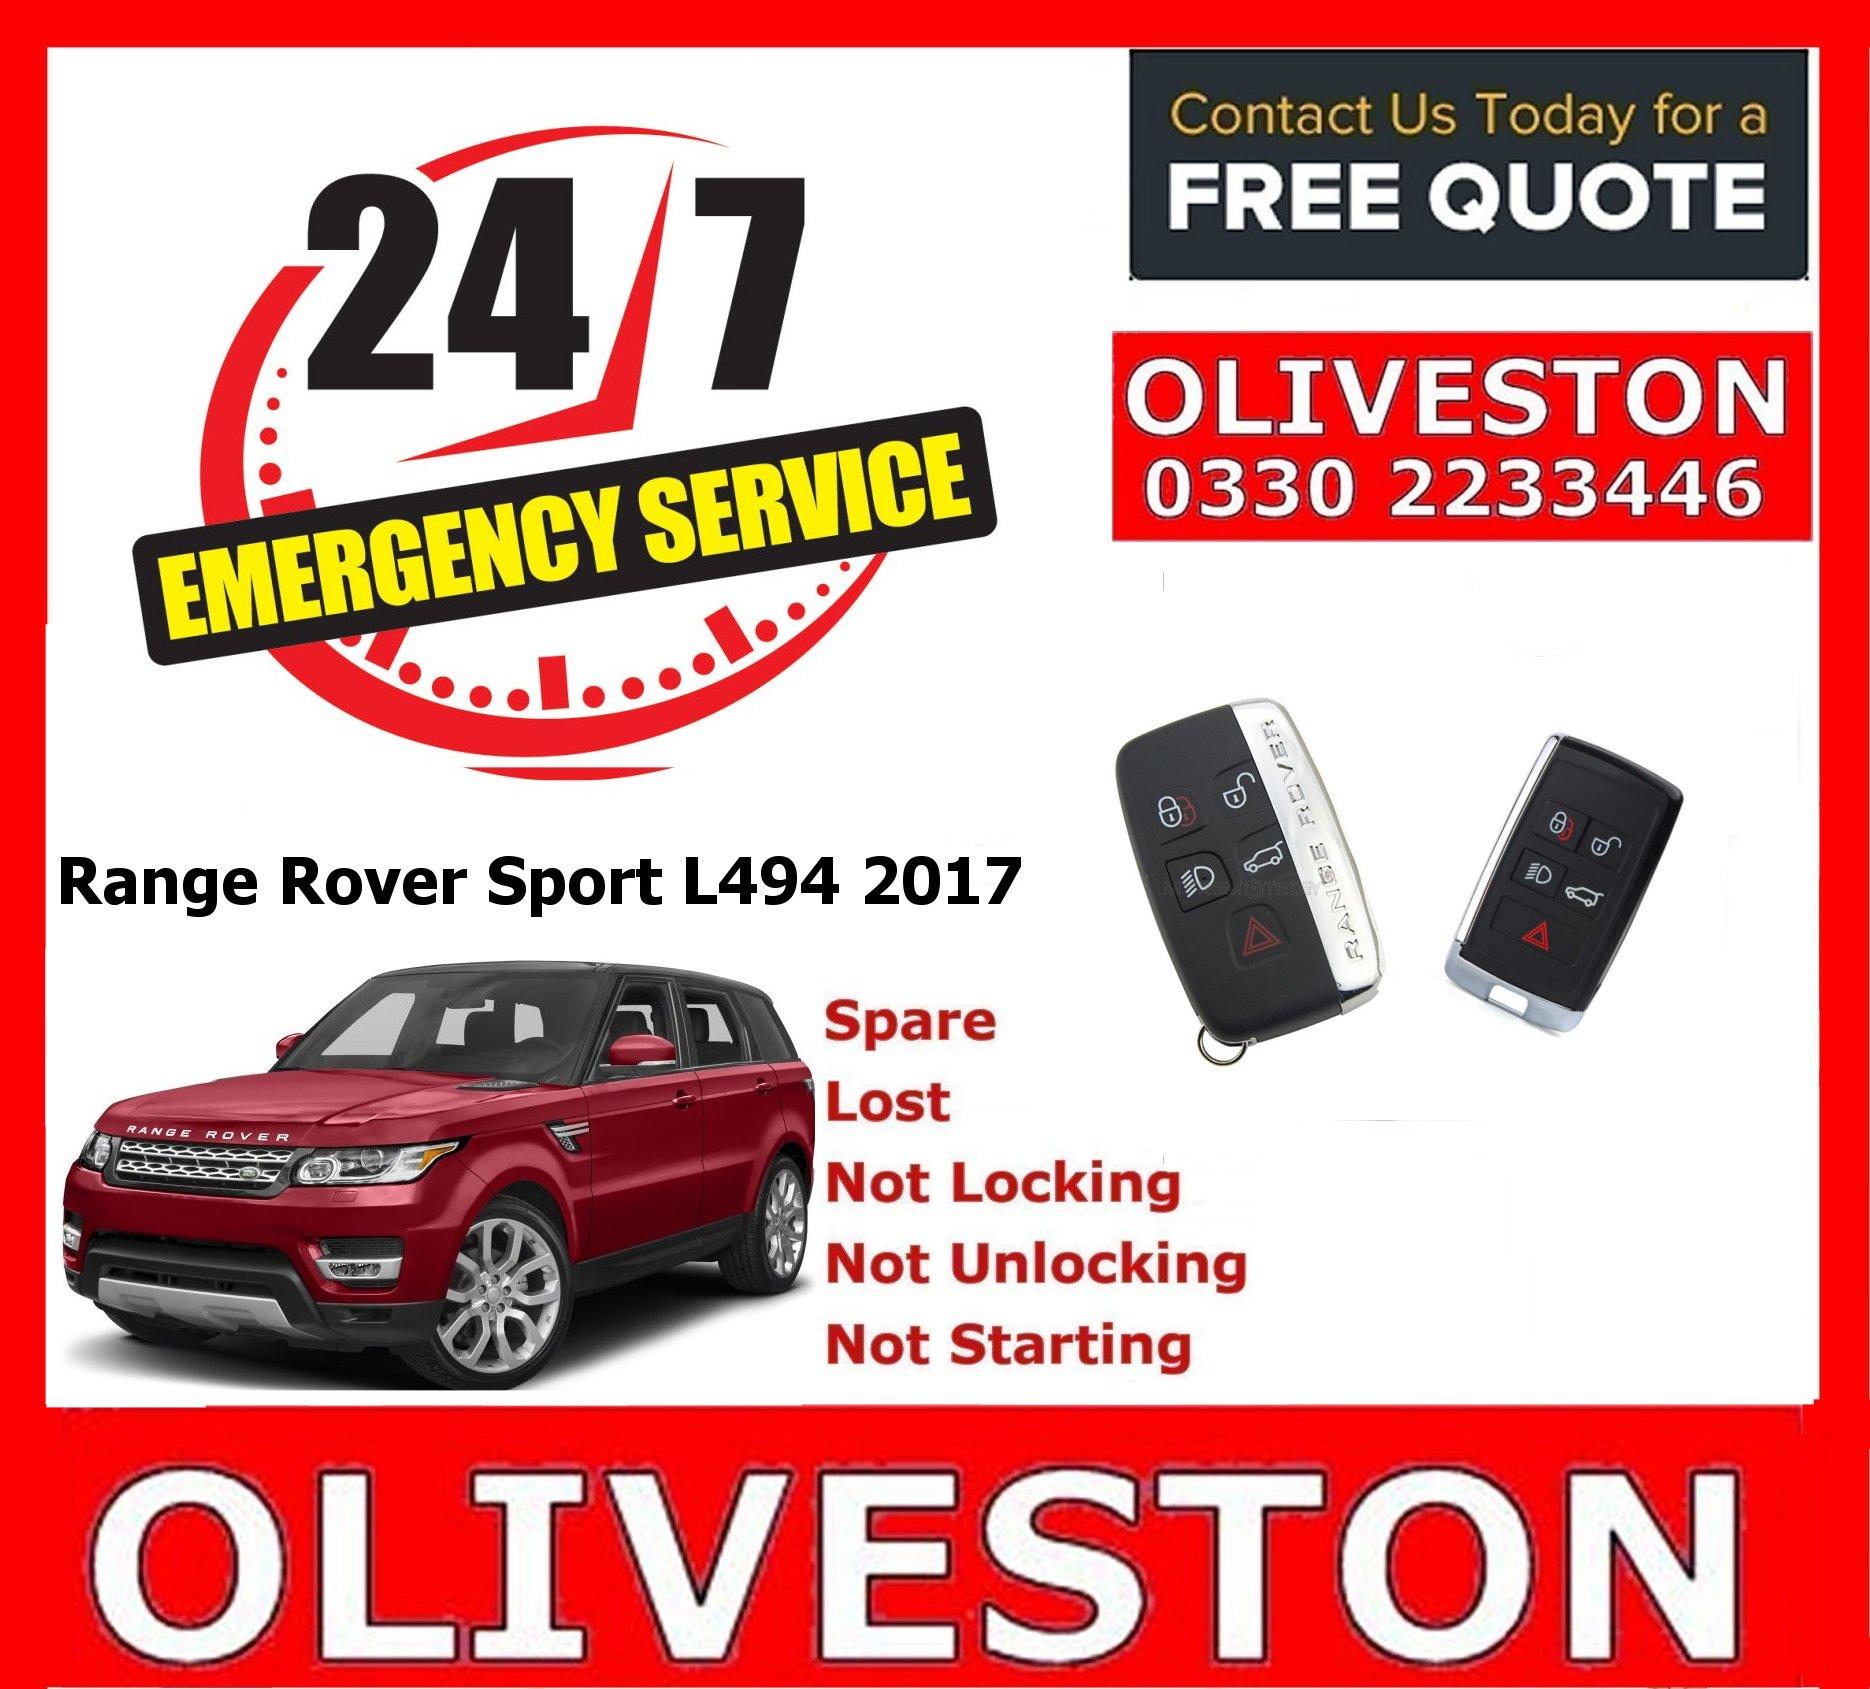 Range Rover Land Rover Jaguar Spare lost keys Reading Slough Bracknell Maidenhead Wokingham Newbury Berkshire South East